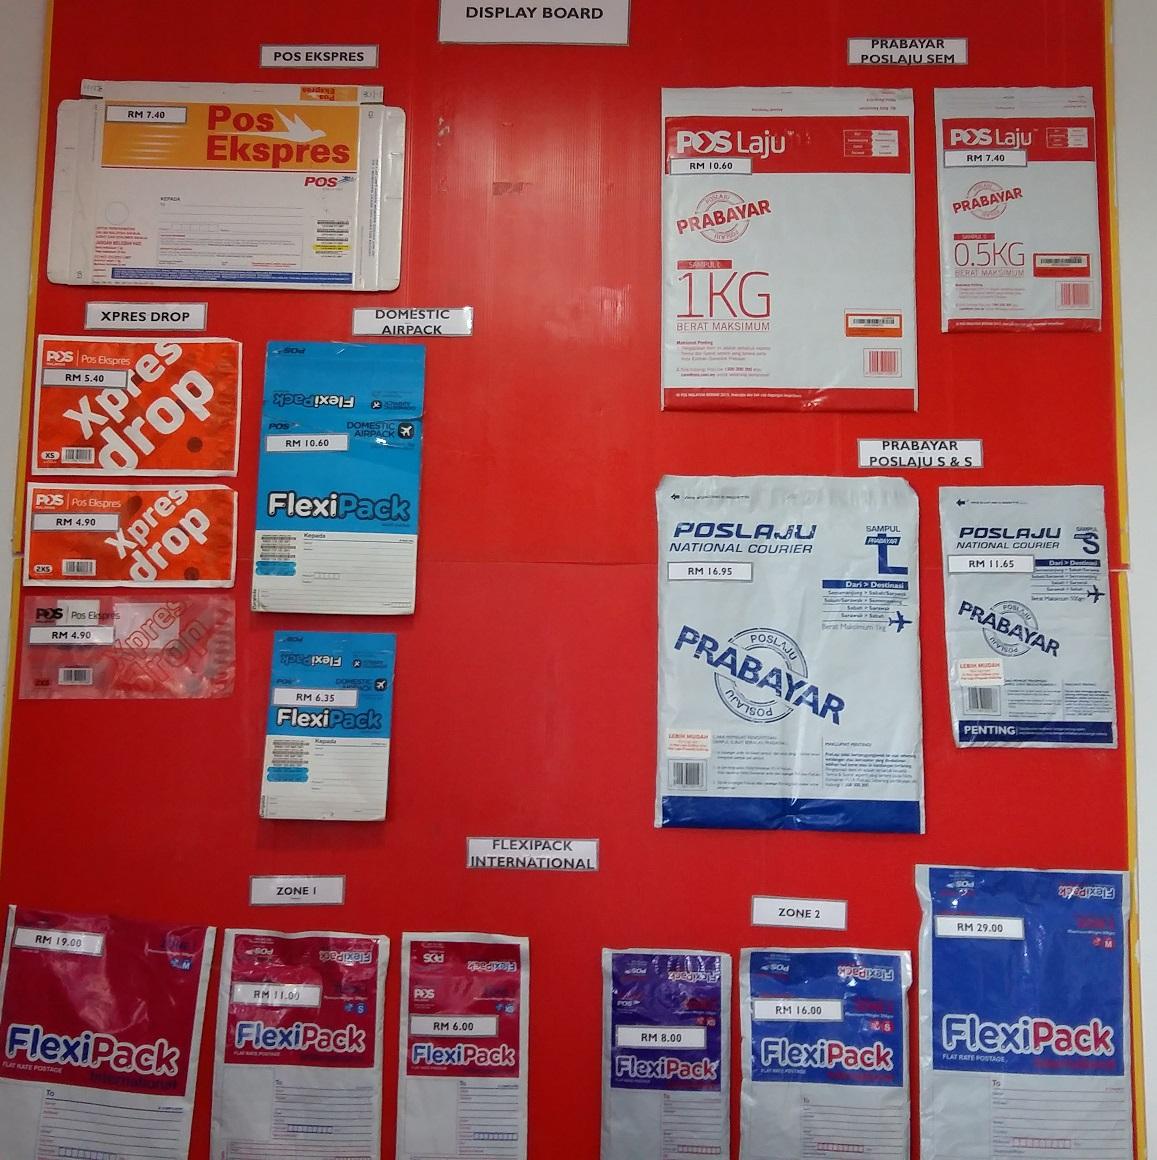 Poslaju Pos Express and FlexiPack envelopes